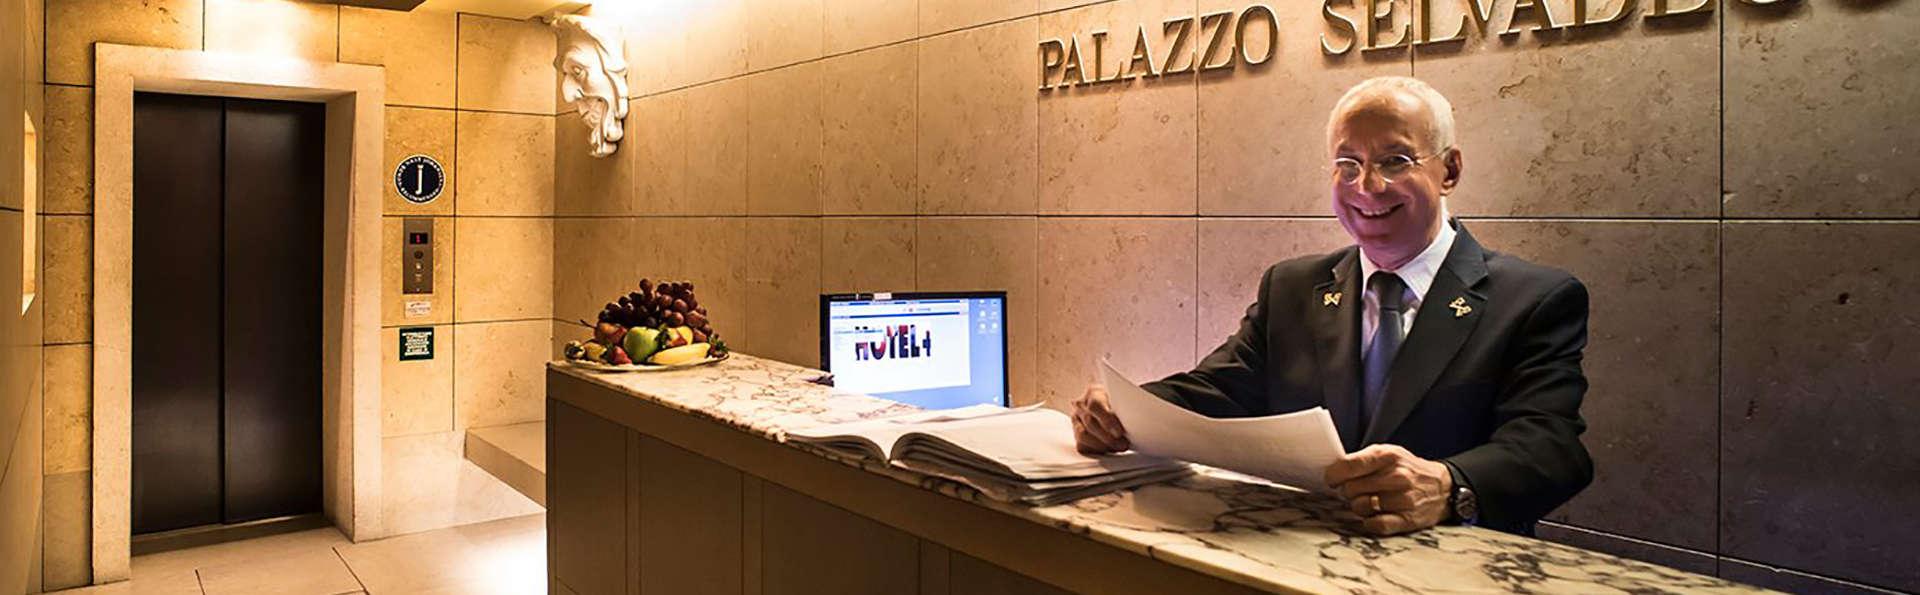 Palazzo Selvadego - Edit_Reception2.jpg